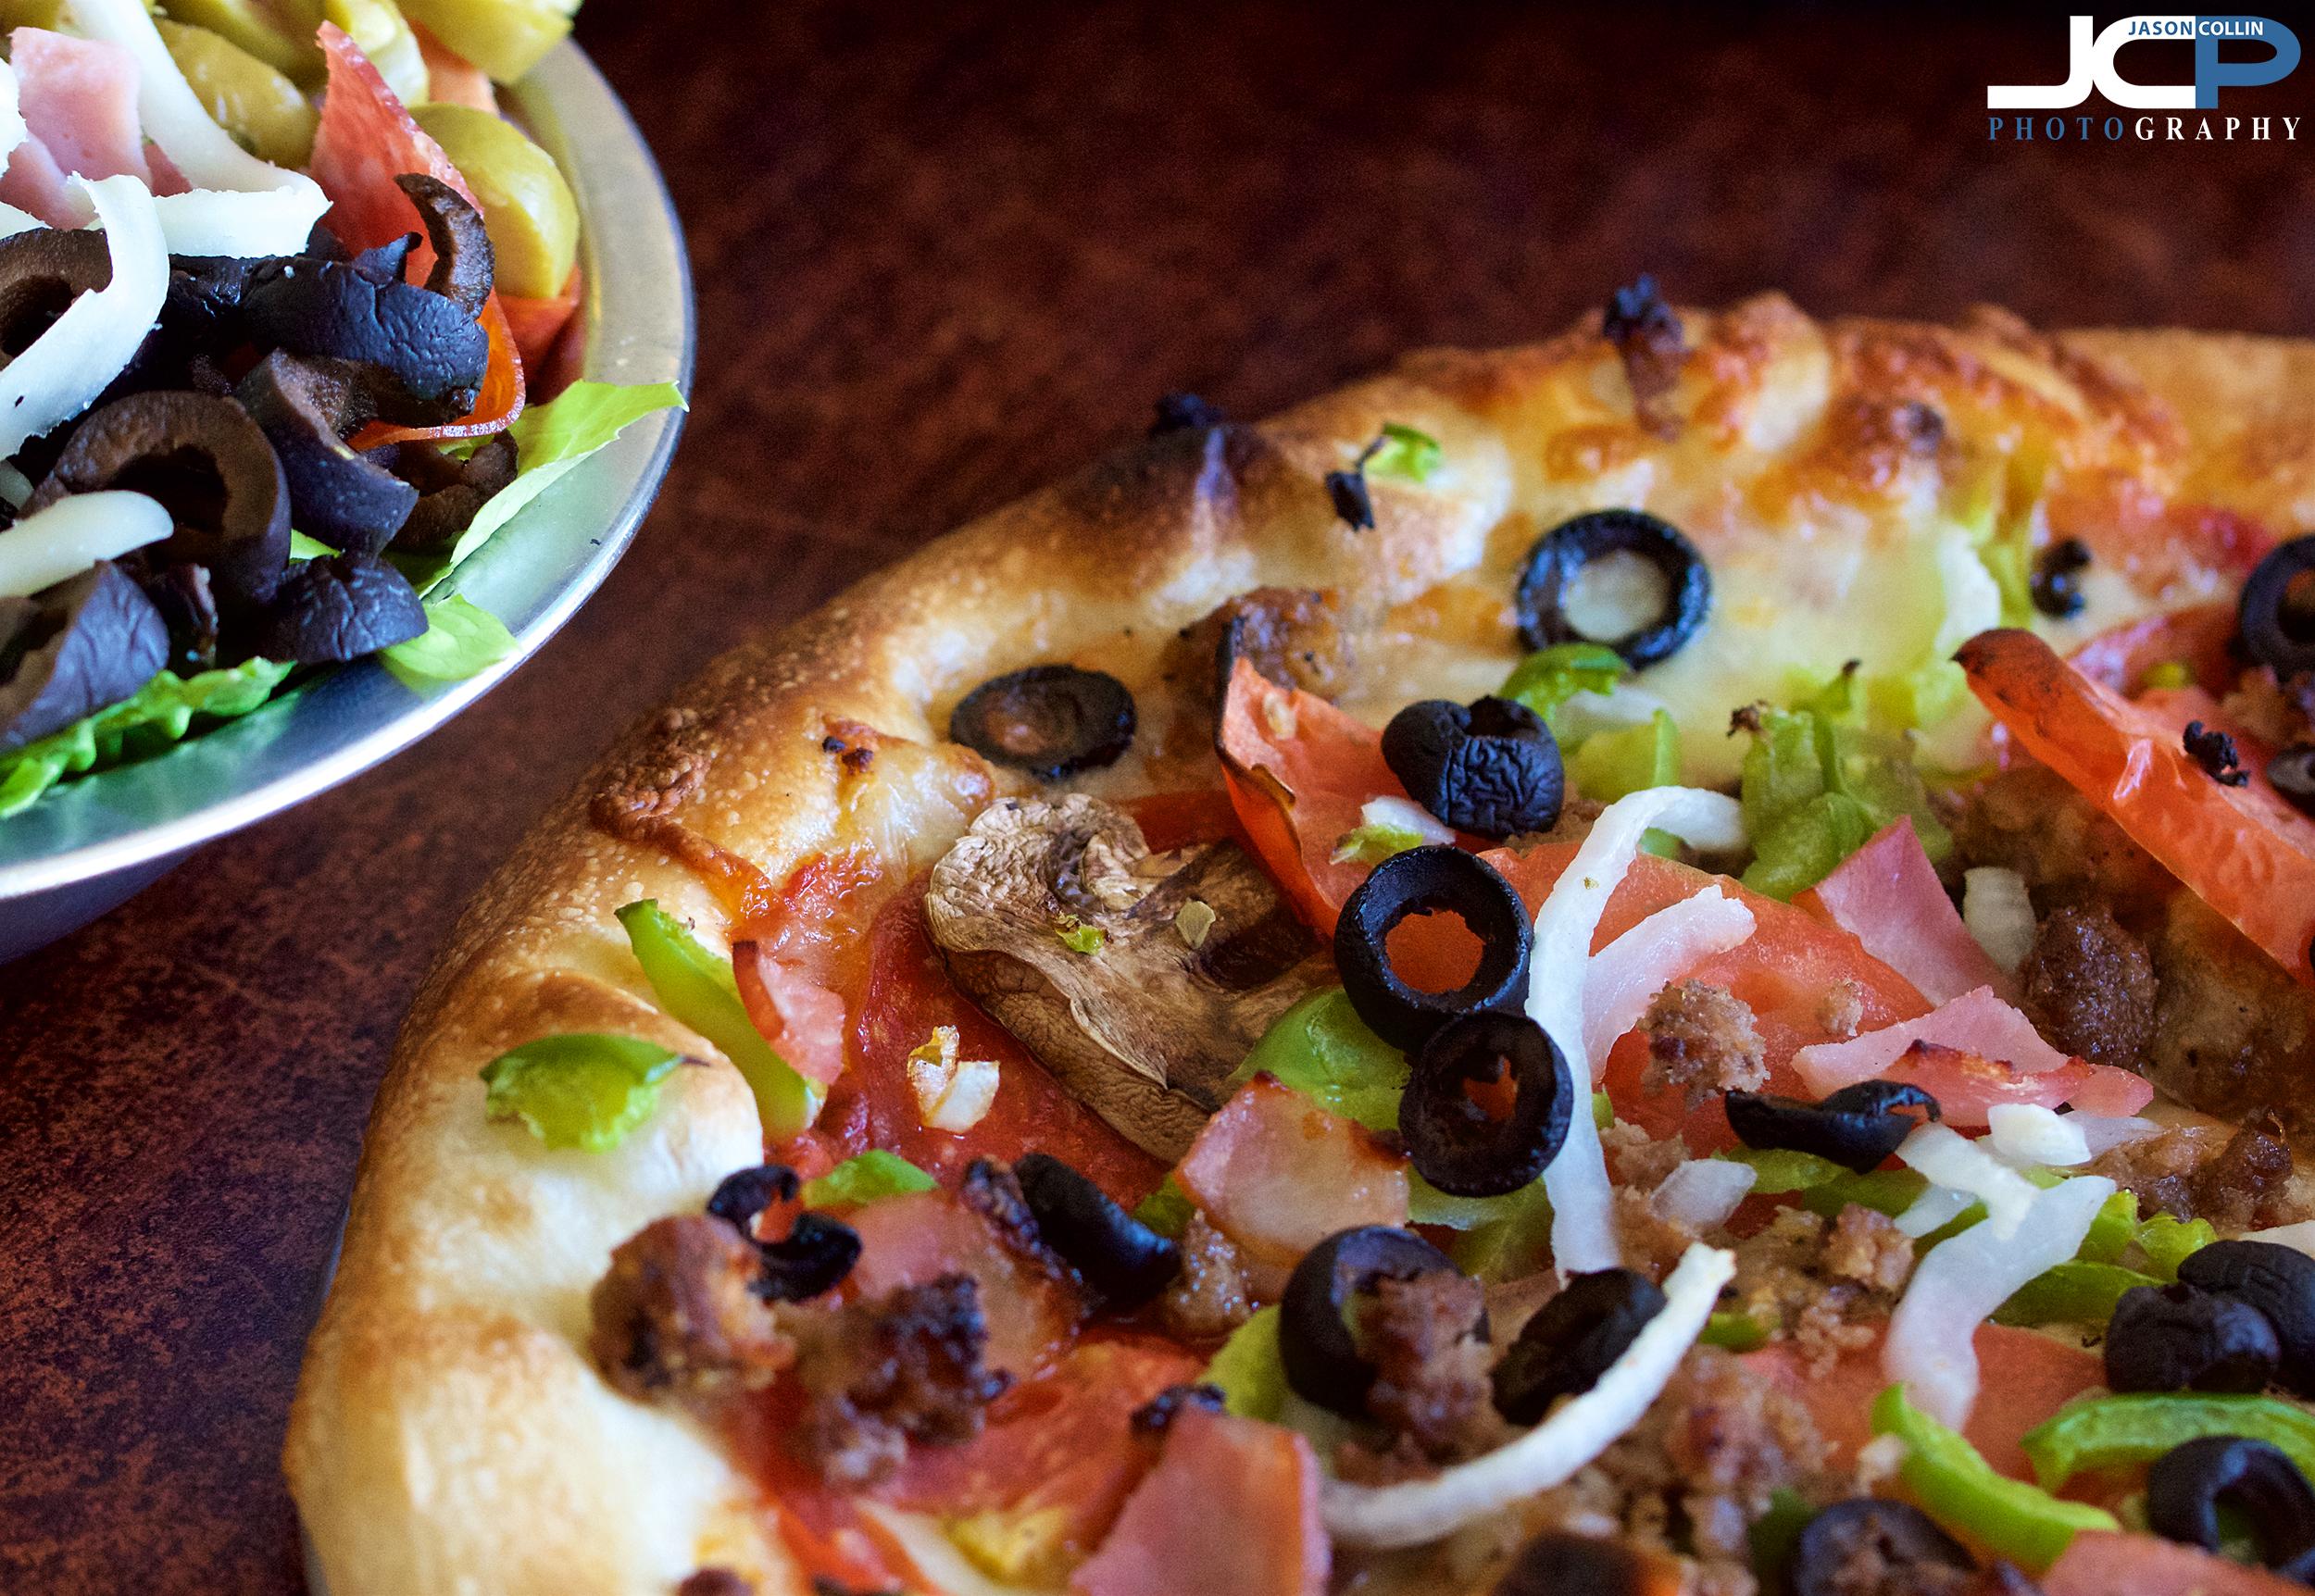 pizza-abq-food-photography-03.jpg